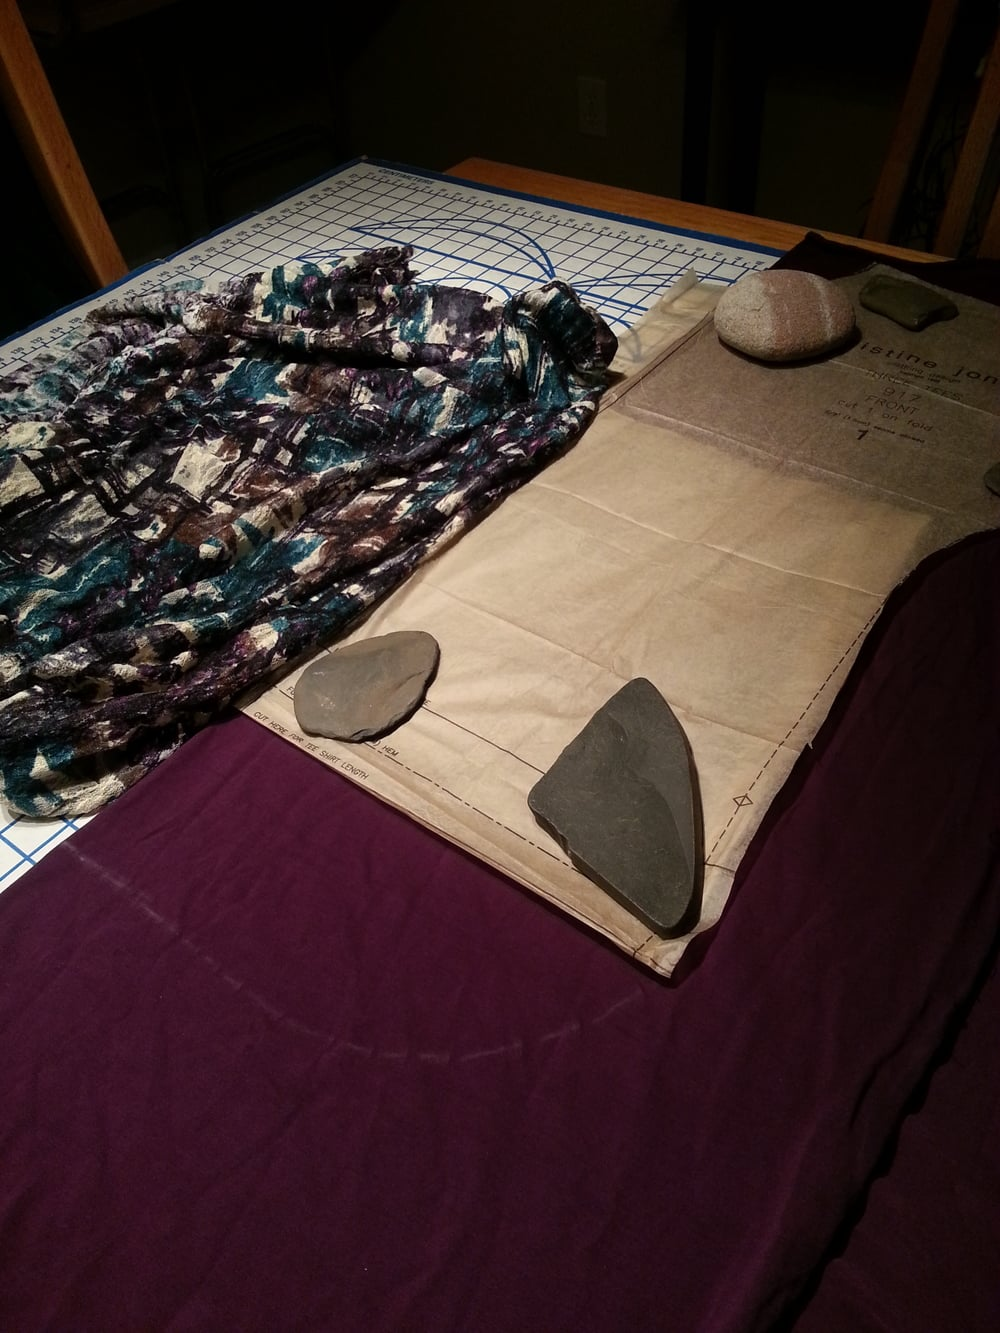 DIY Shirttail Hem on a Tee Shirt Sewing Pattern